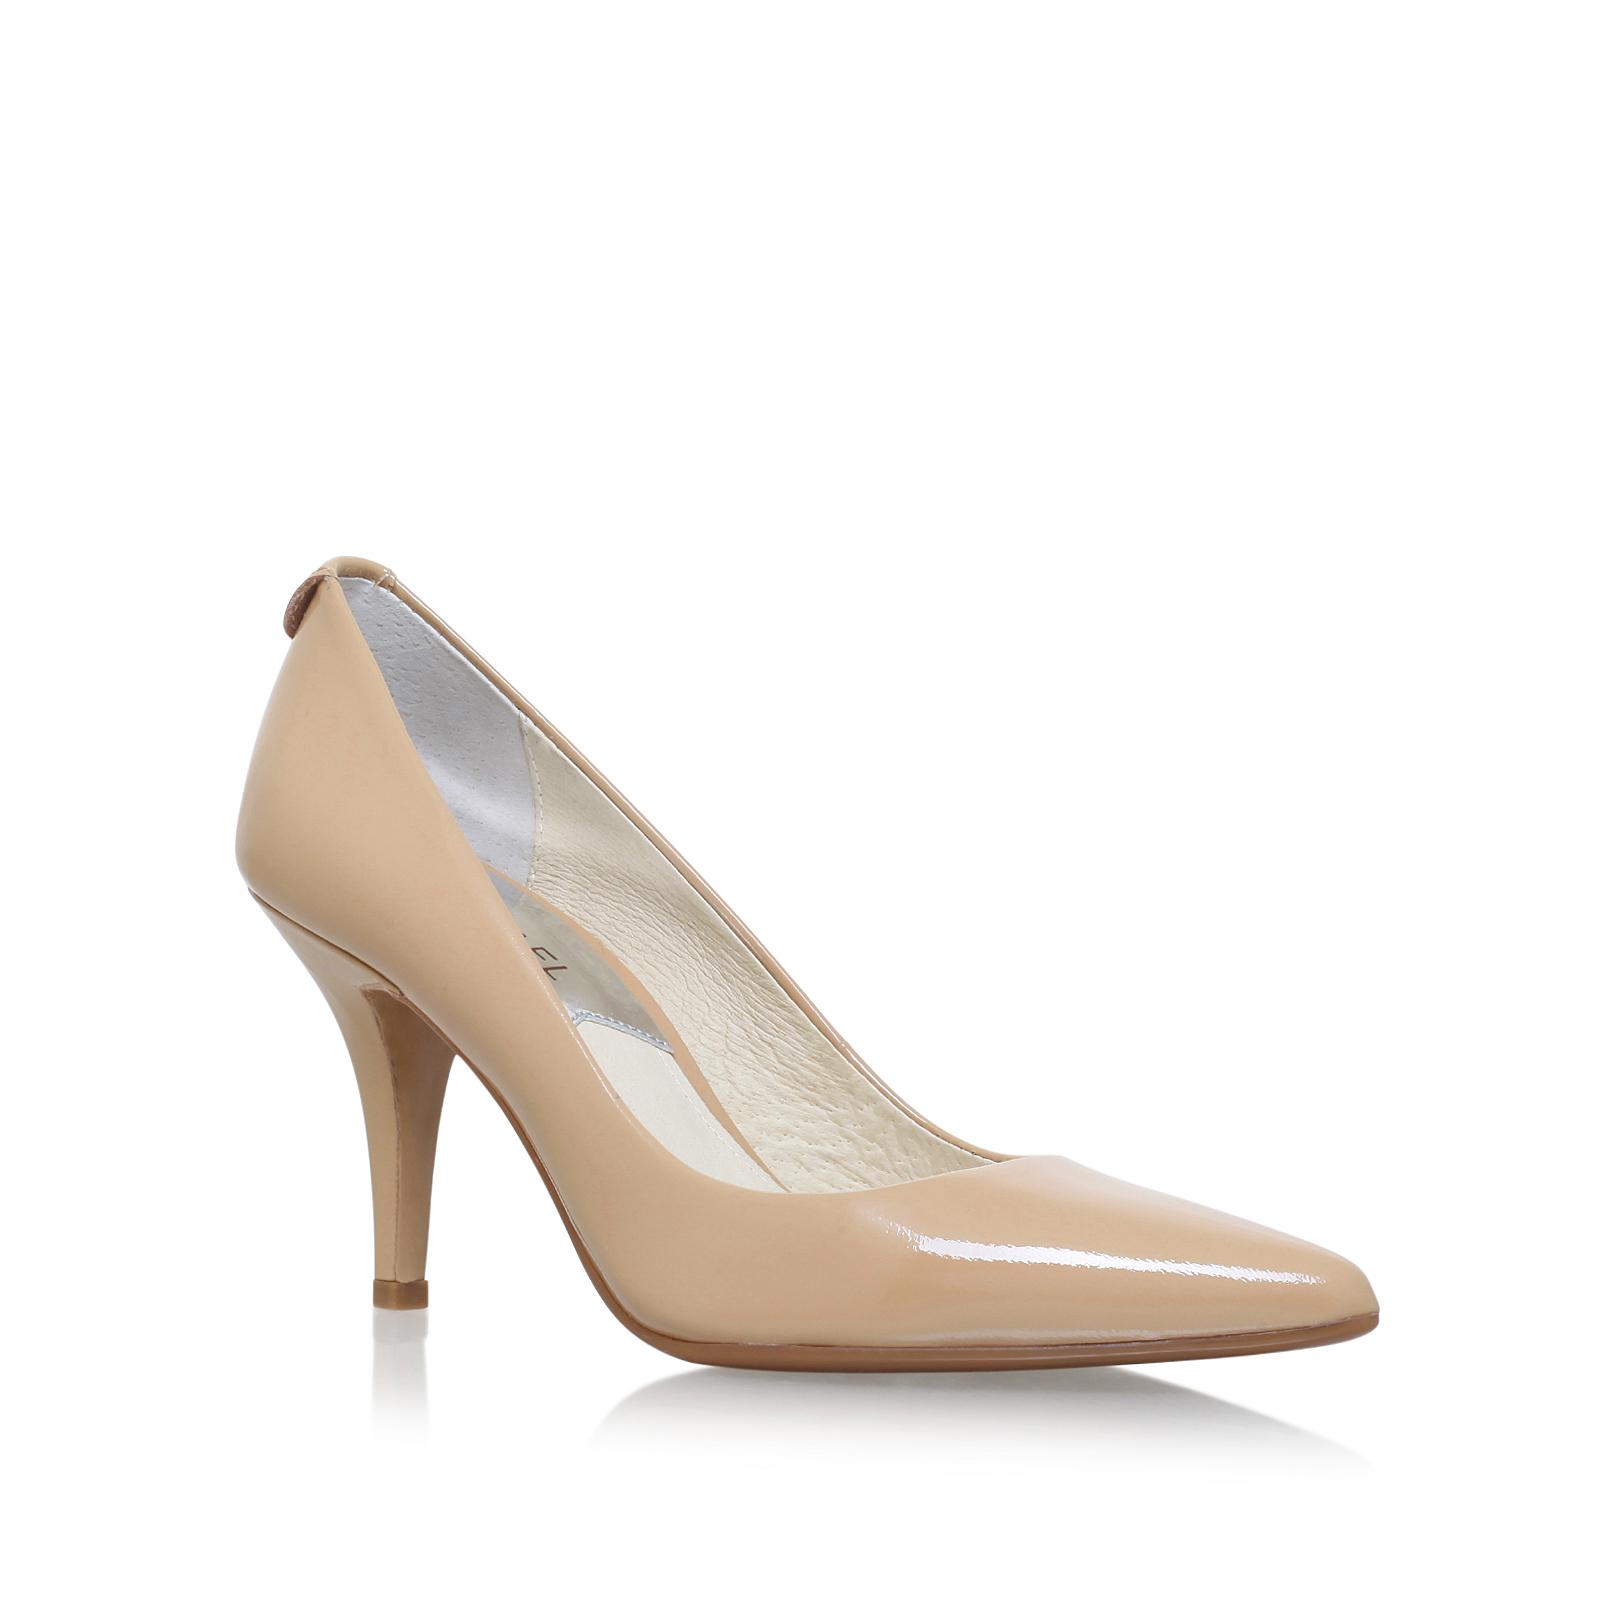 c4f607bec491 MK FLEX MID PUMP Michael Michael Kors Mk Flex Mid Pump Nude Patent Mid Heel  Court Shoes by MICHAEL MICHAEL KORS